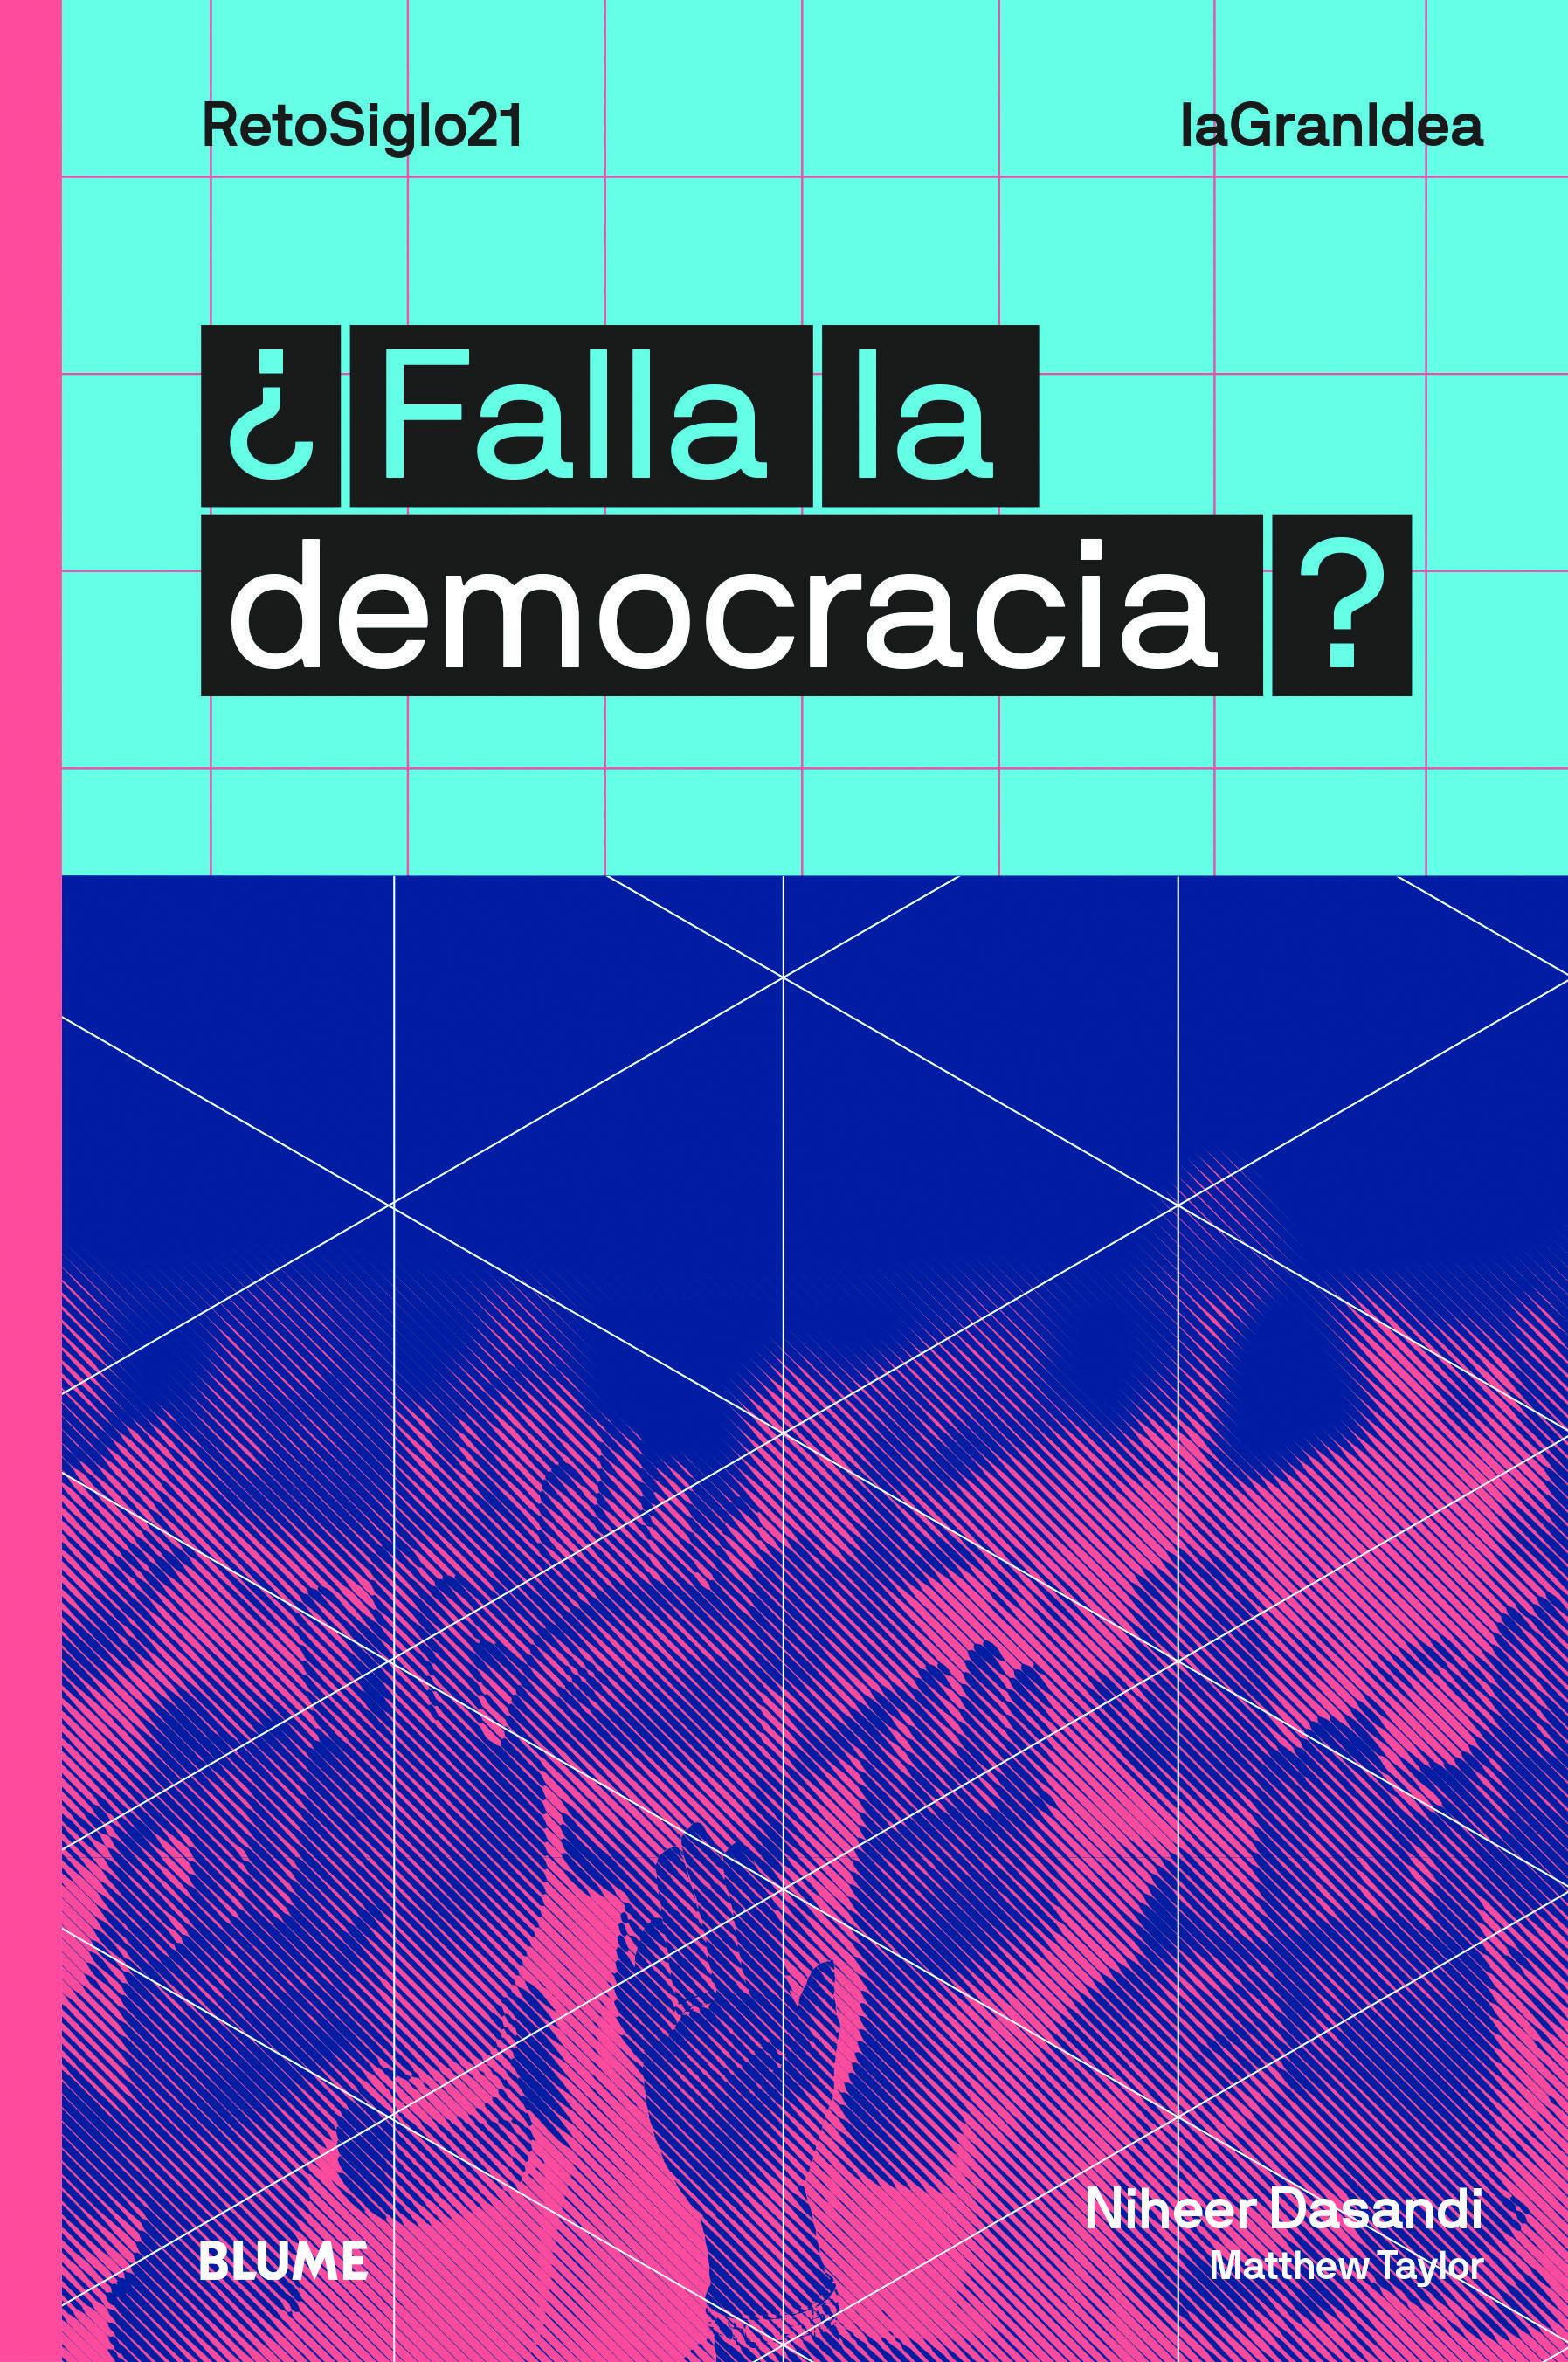 FALLA LA DEMOCRACIA?